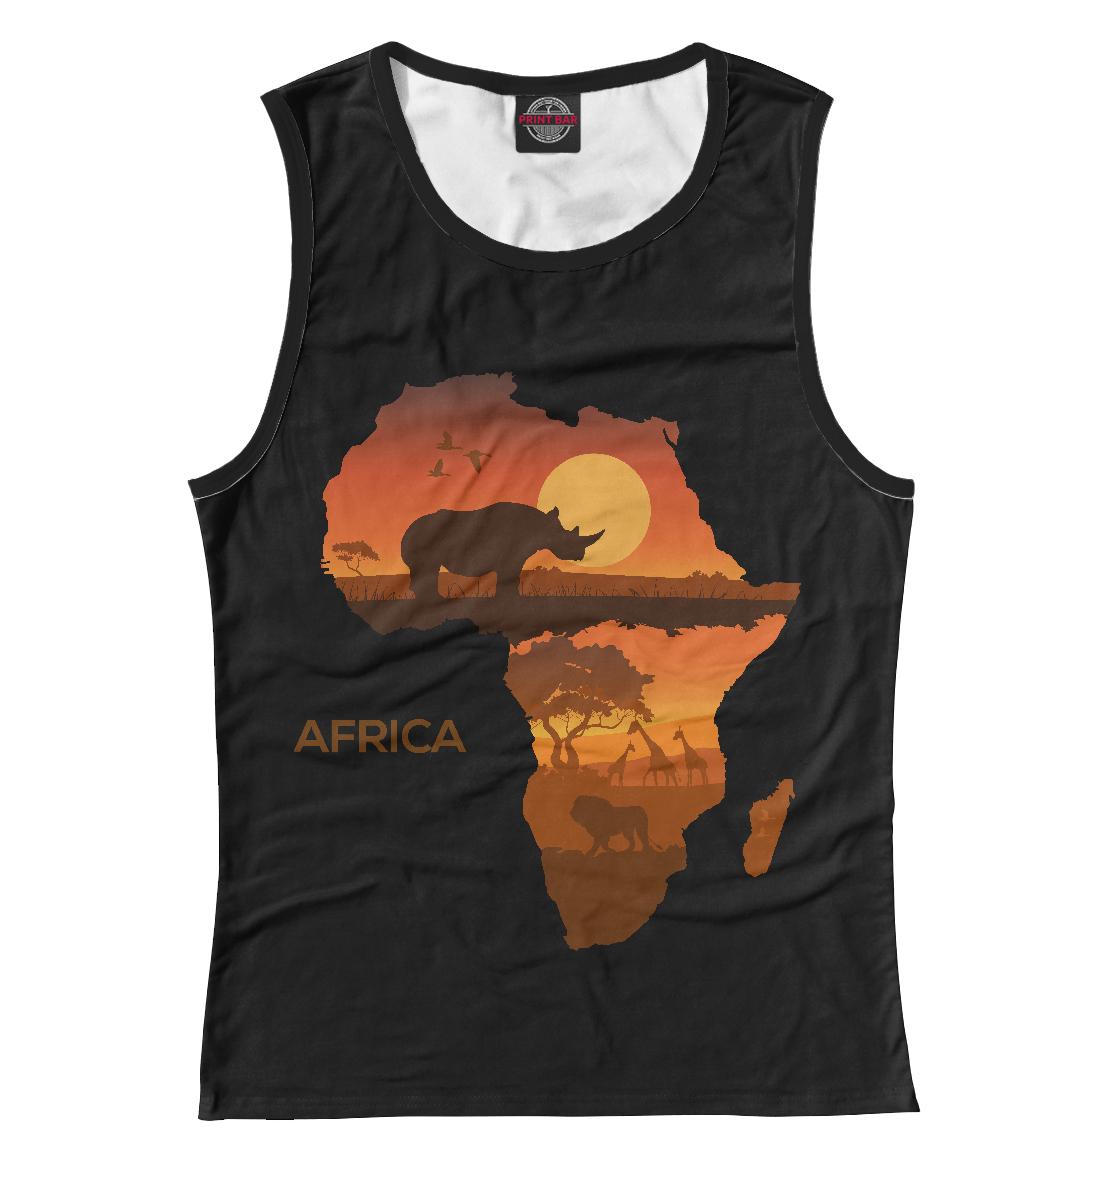 Фото - Африка необыкновенное путешествие африка